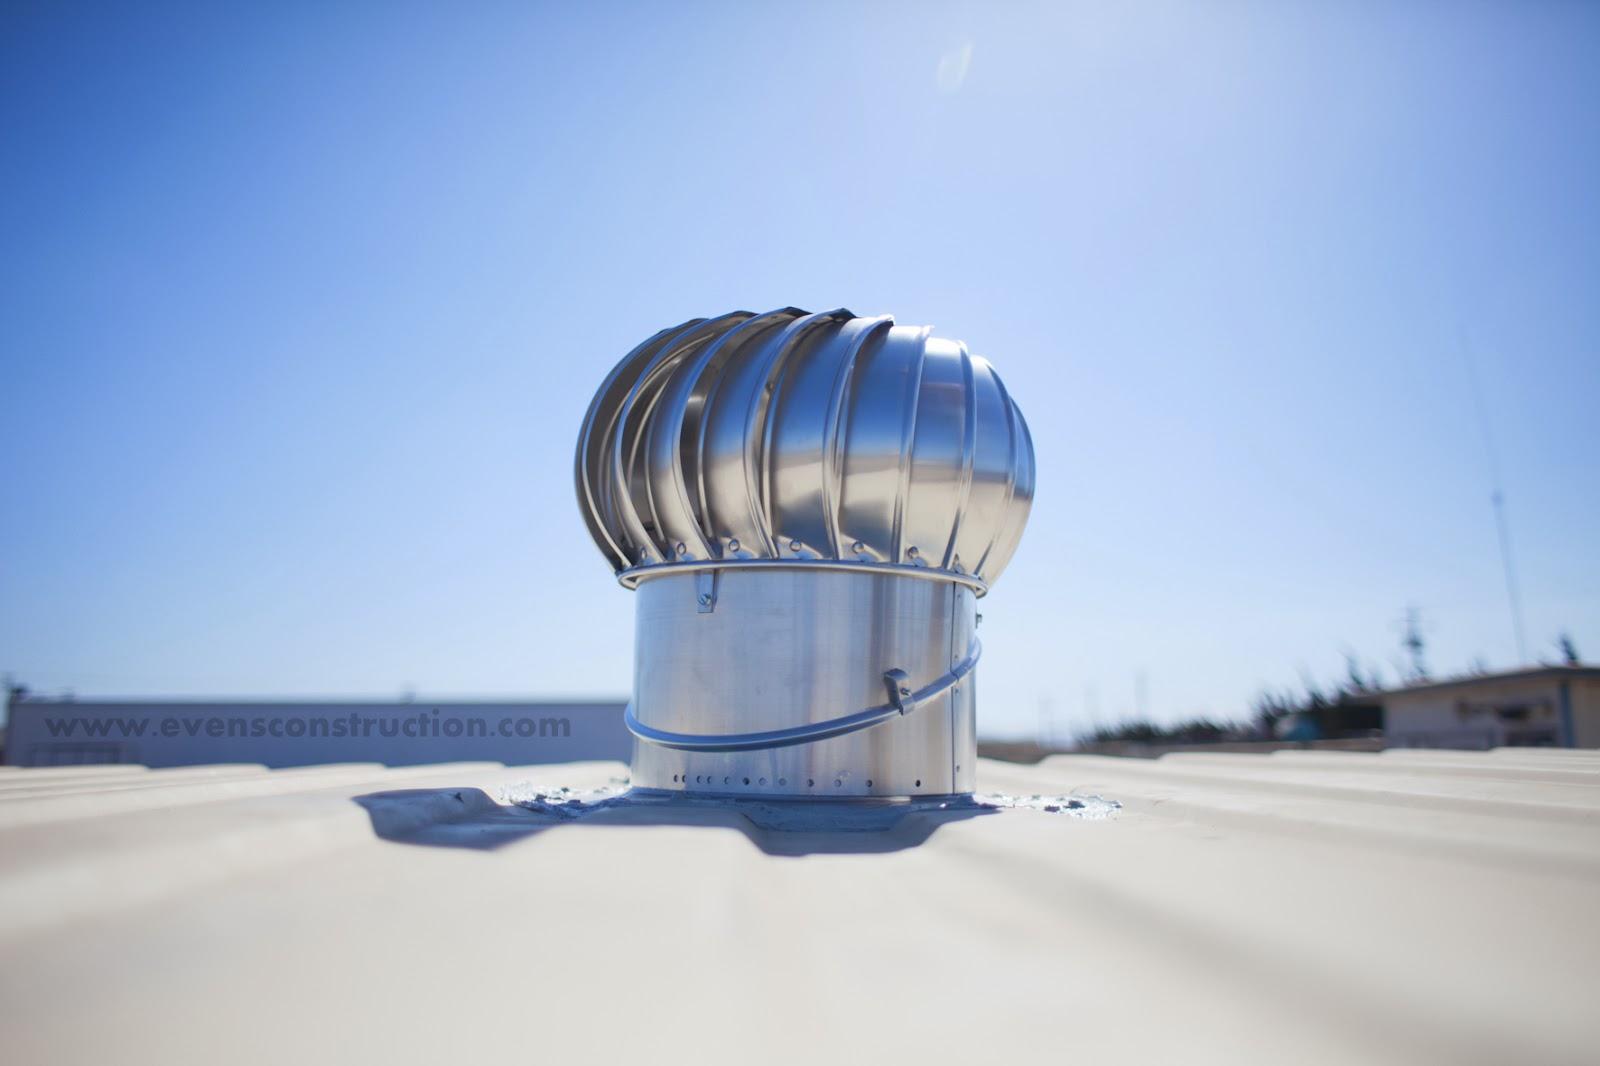 Evens Construction Pvt Ltd Turbine Air Ventilation